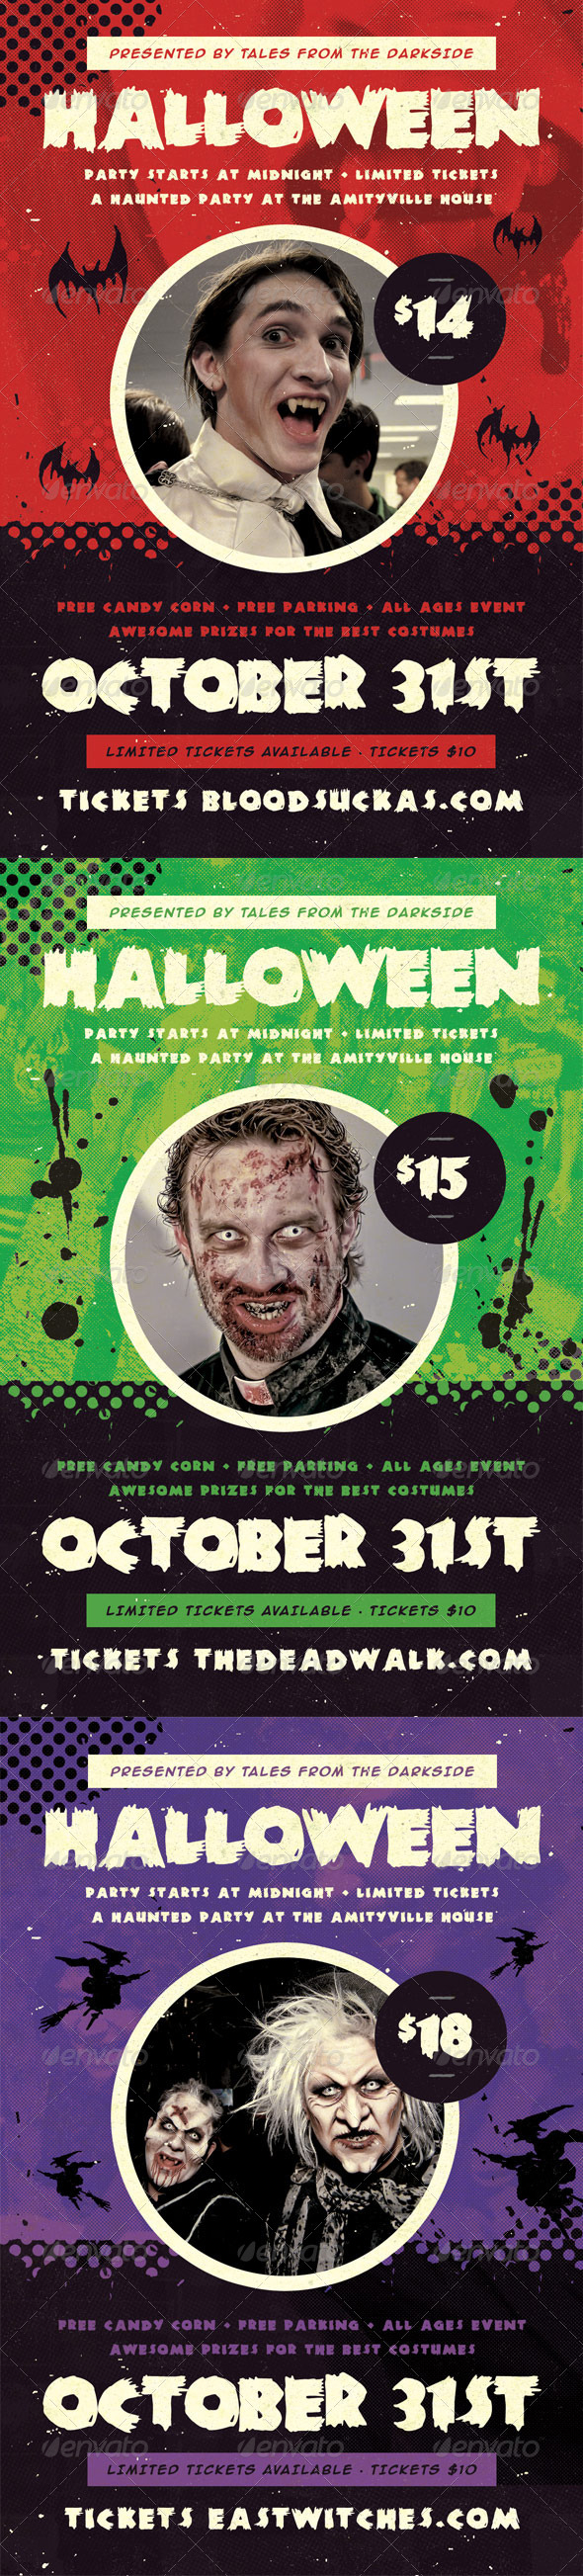 GraphicRiver Haunted Halloween Flyer Template 5755729